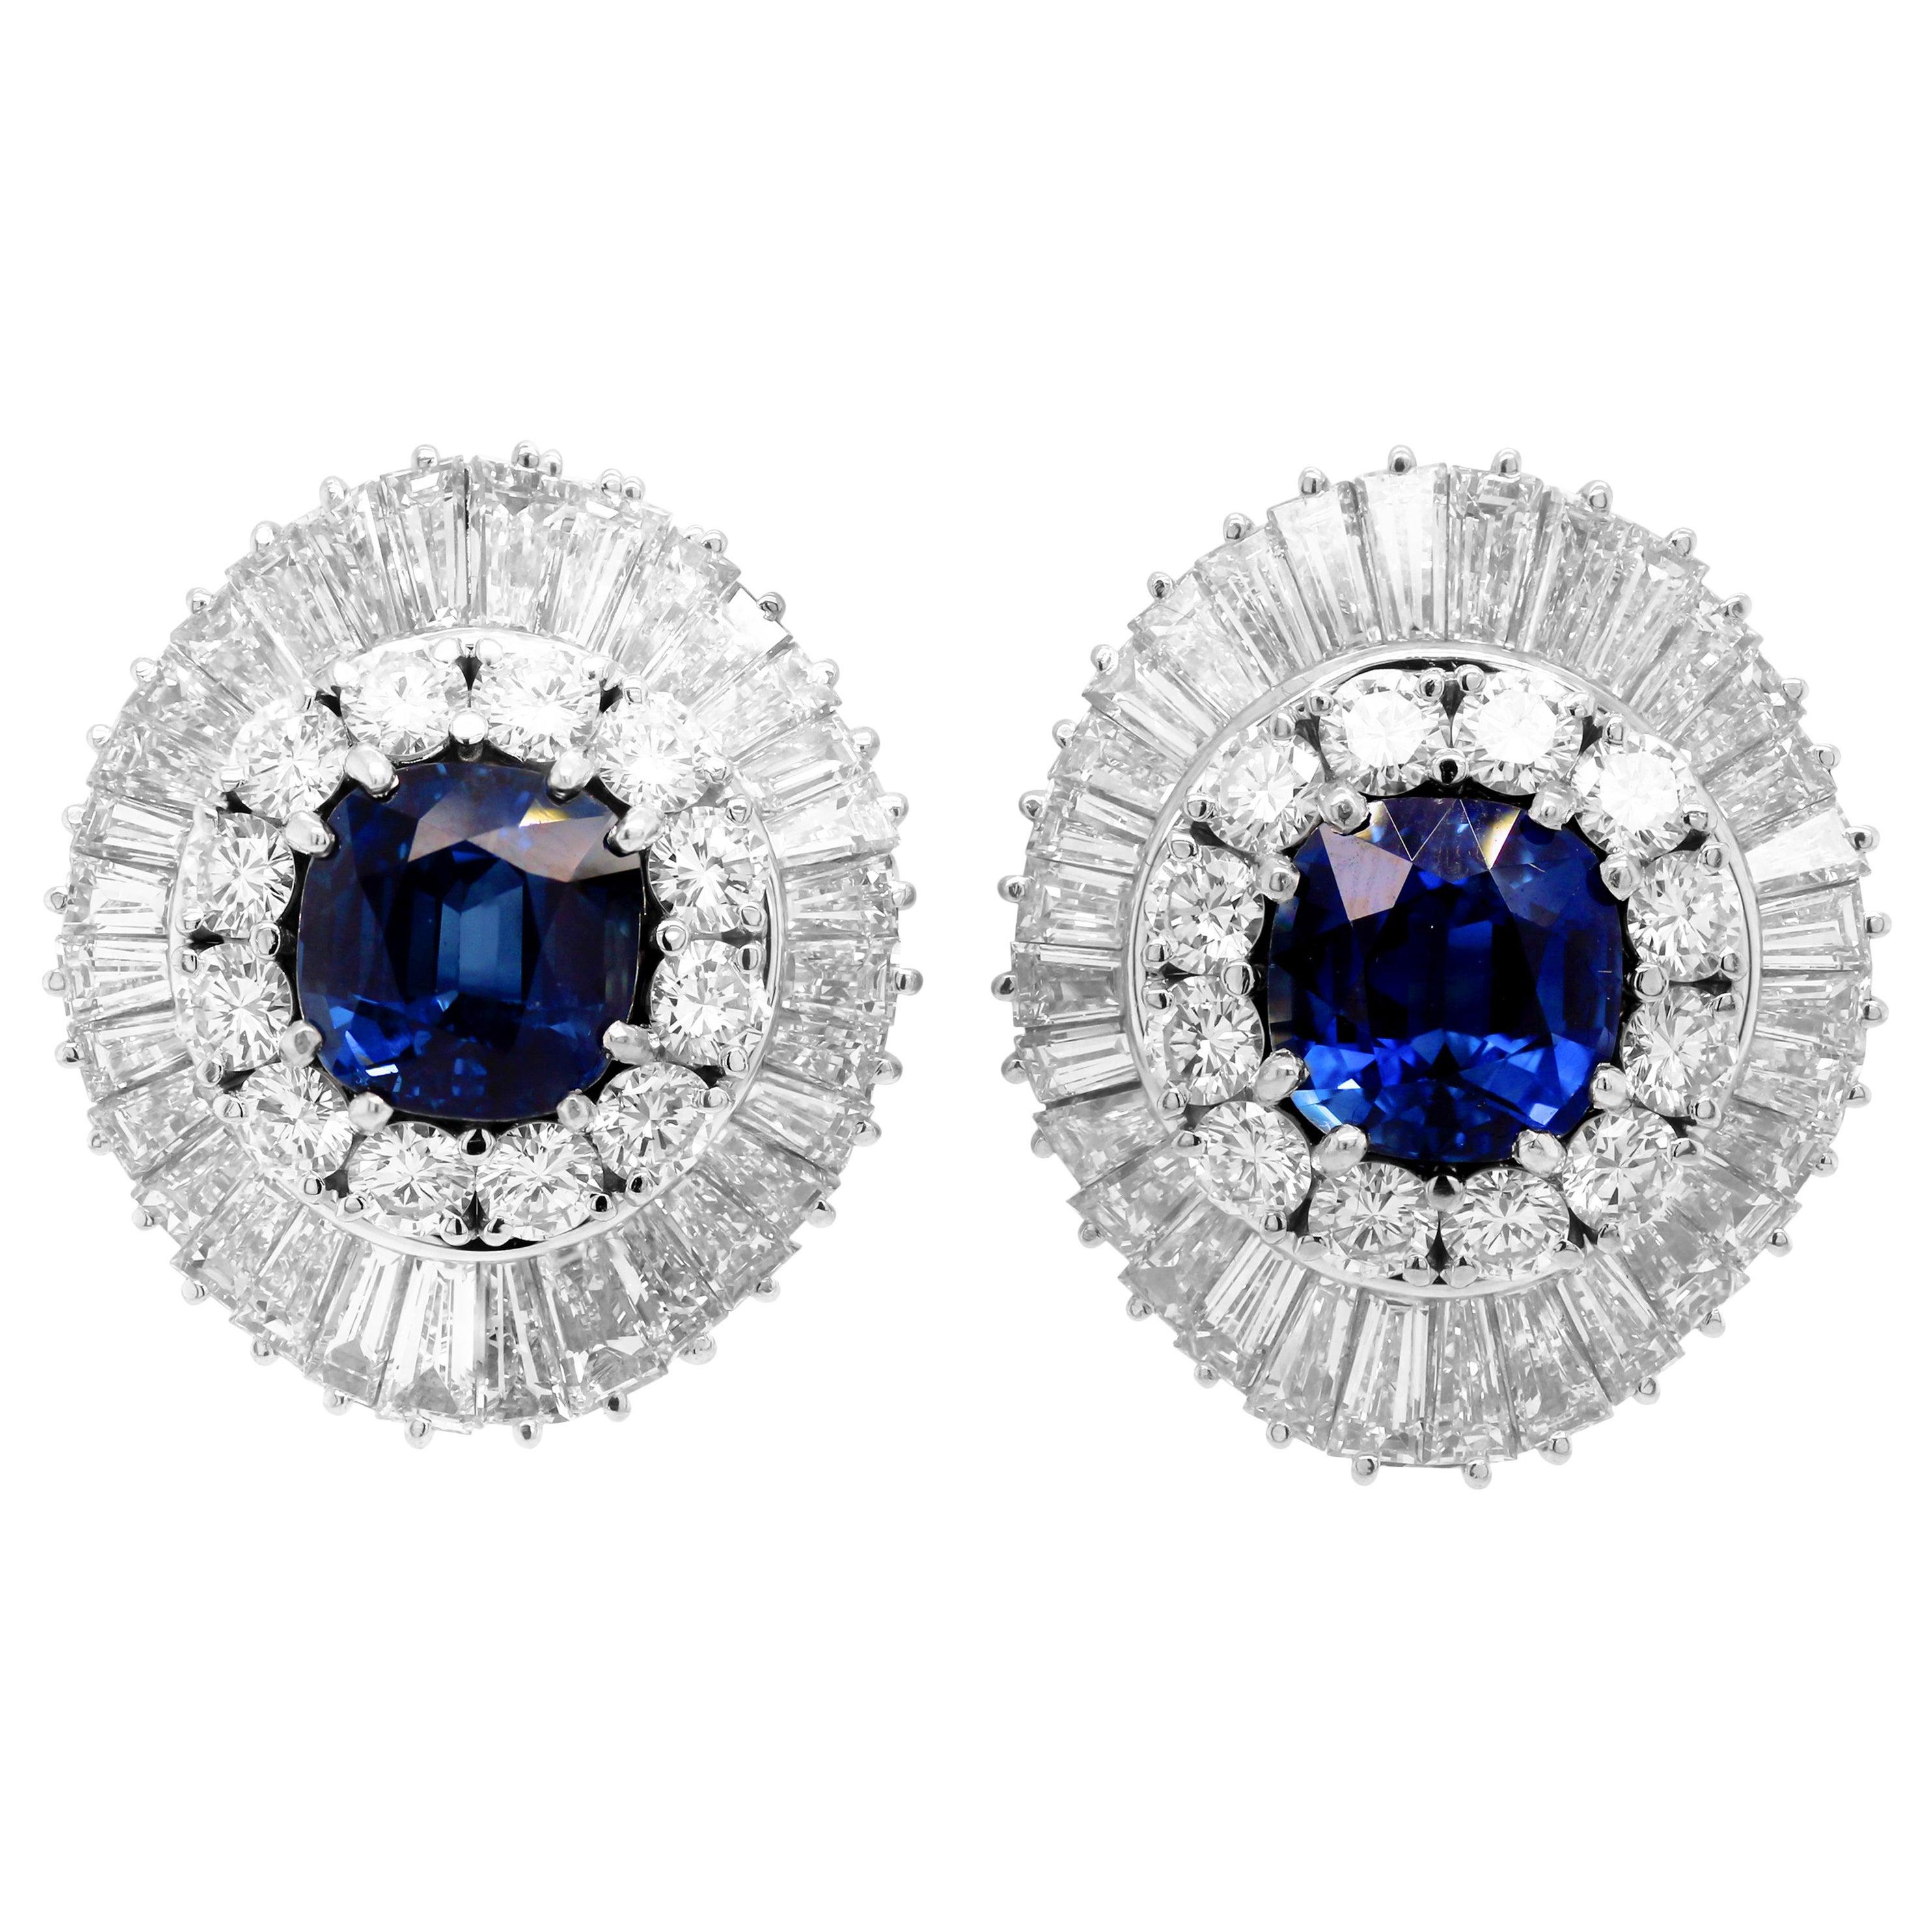 Ceylon Cushion Blue Sapphire Tapered Baguette Round Diamond Platinum Earrings